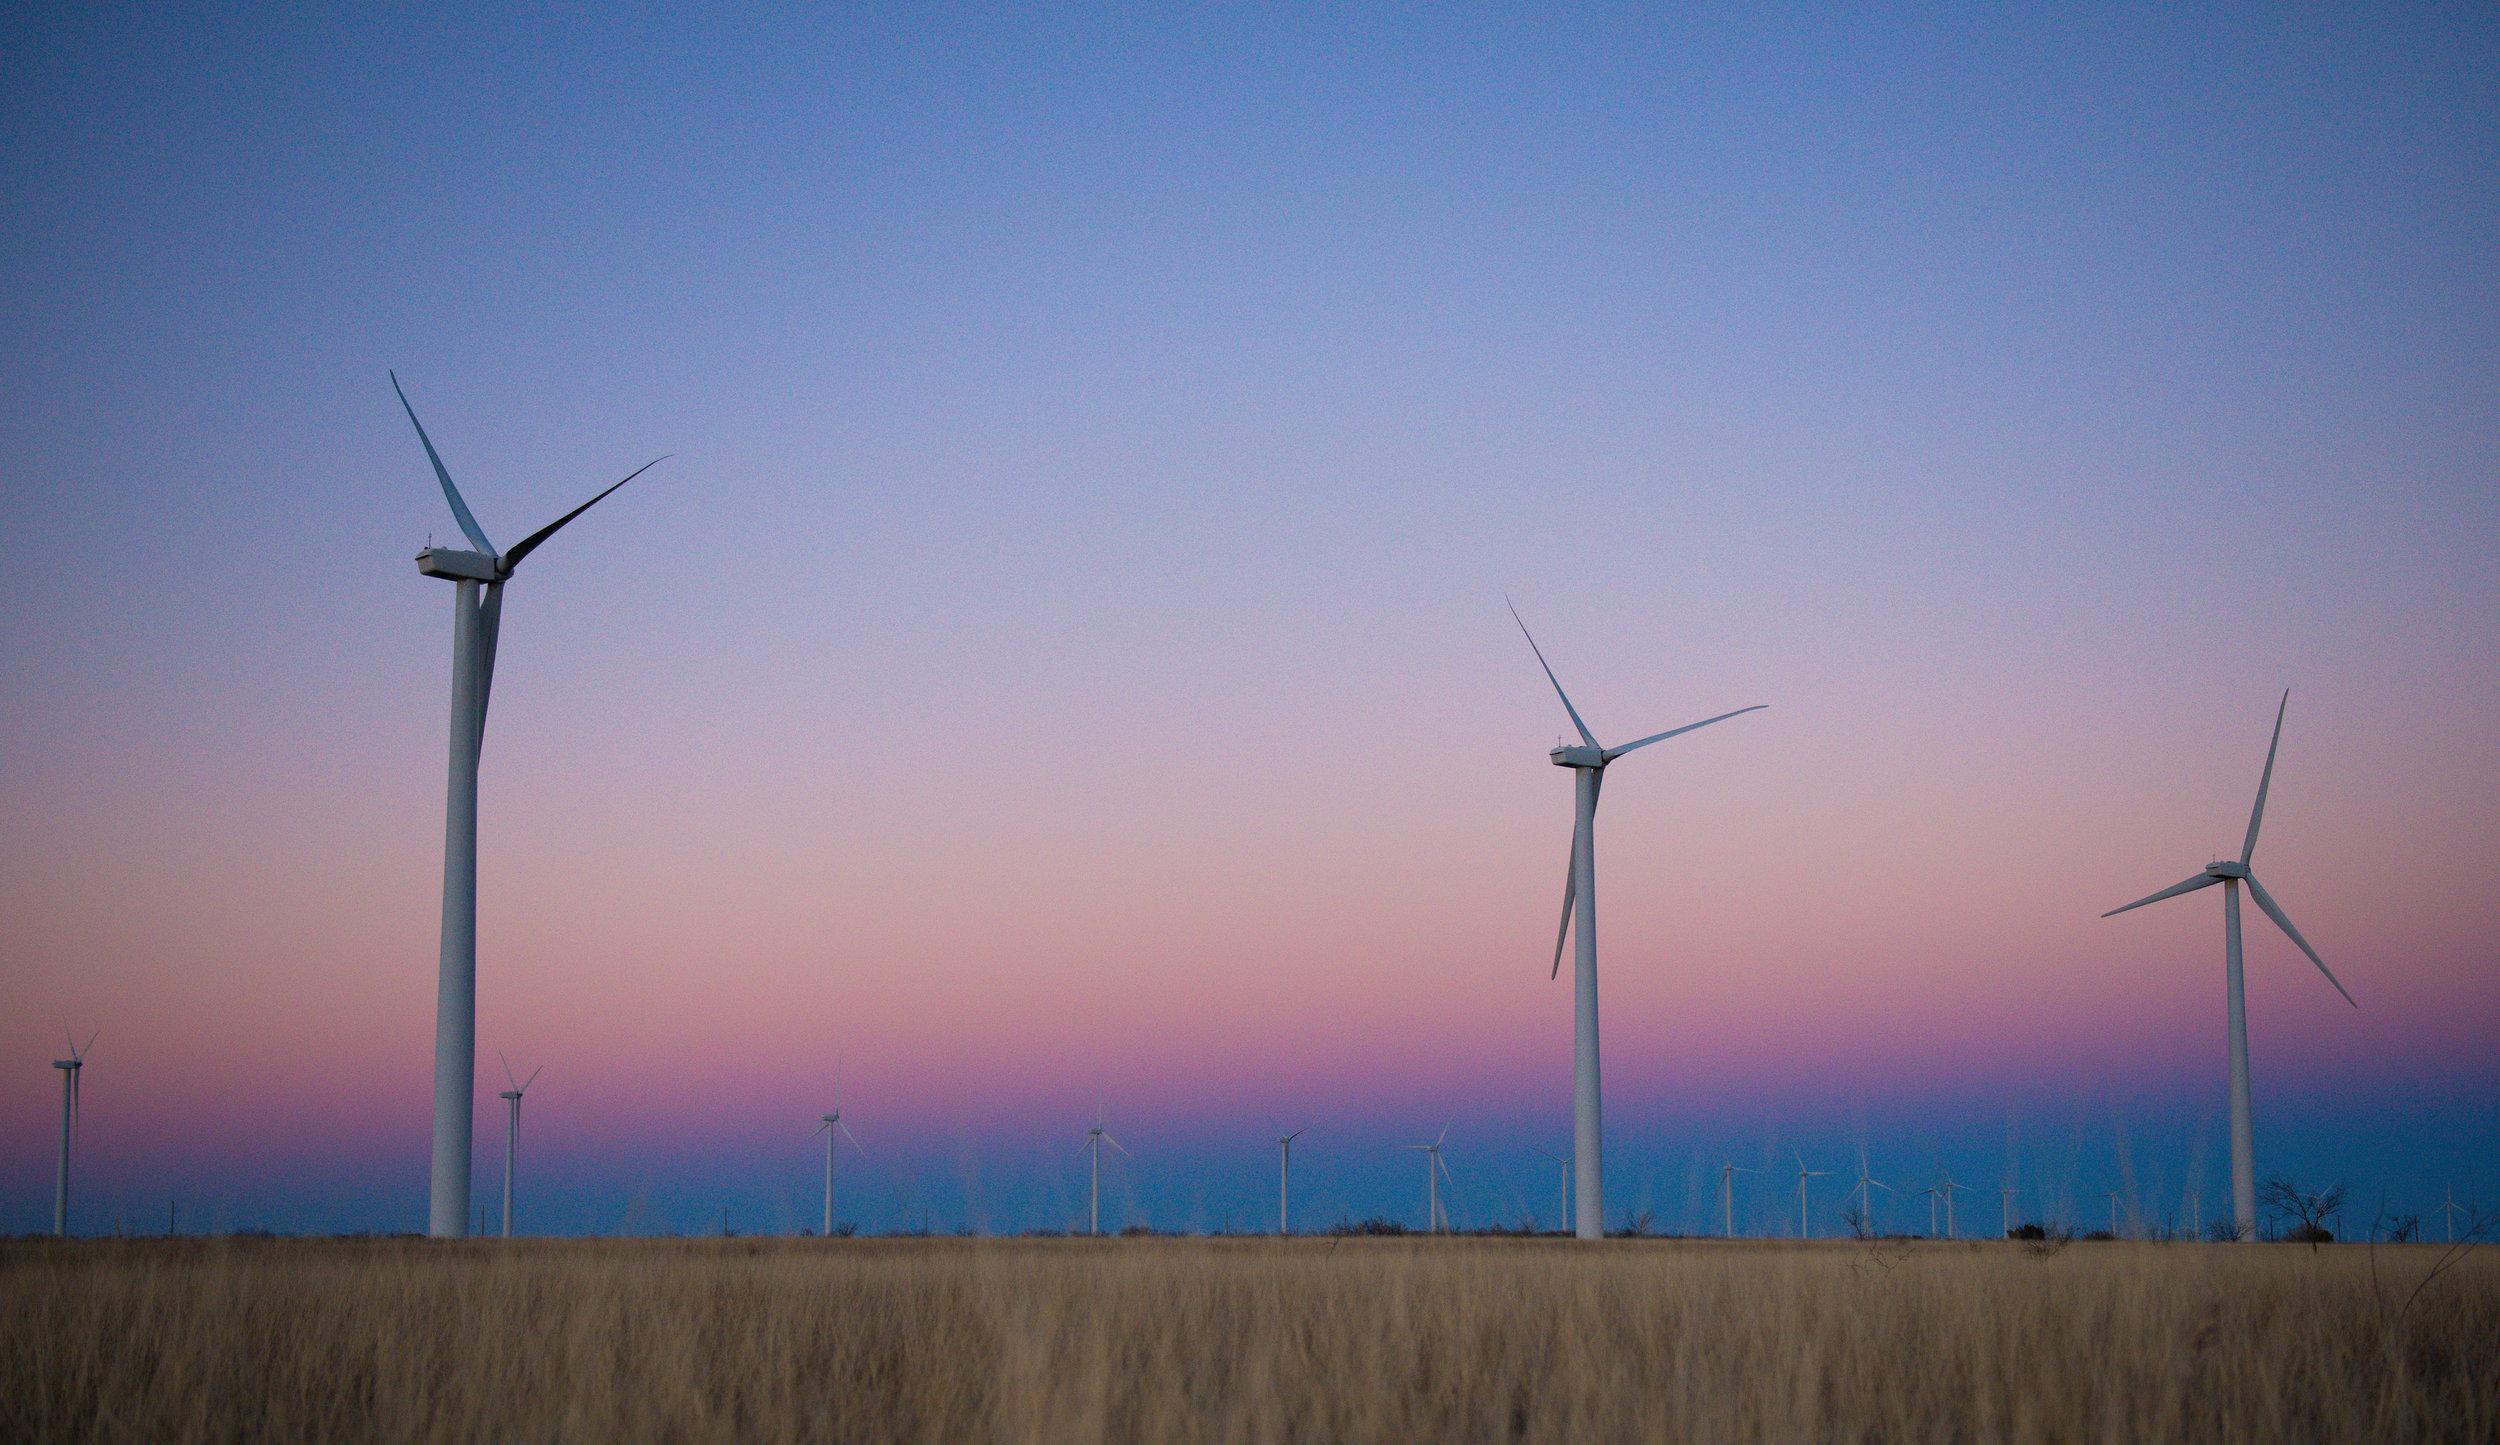 windmills2 (1 of 1).jpg